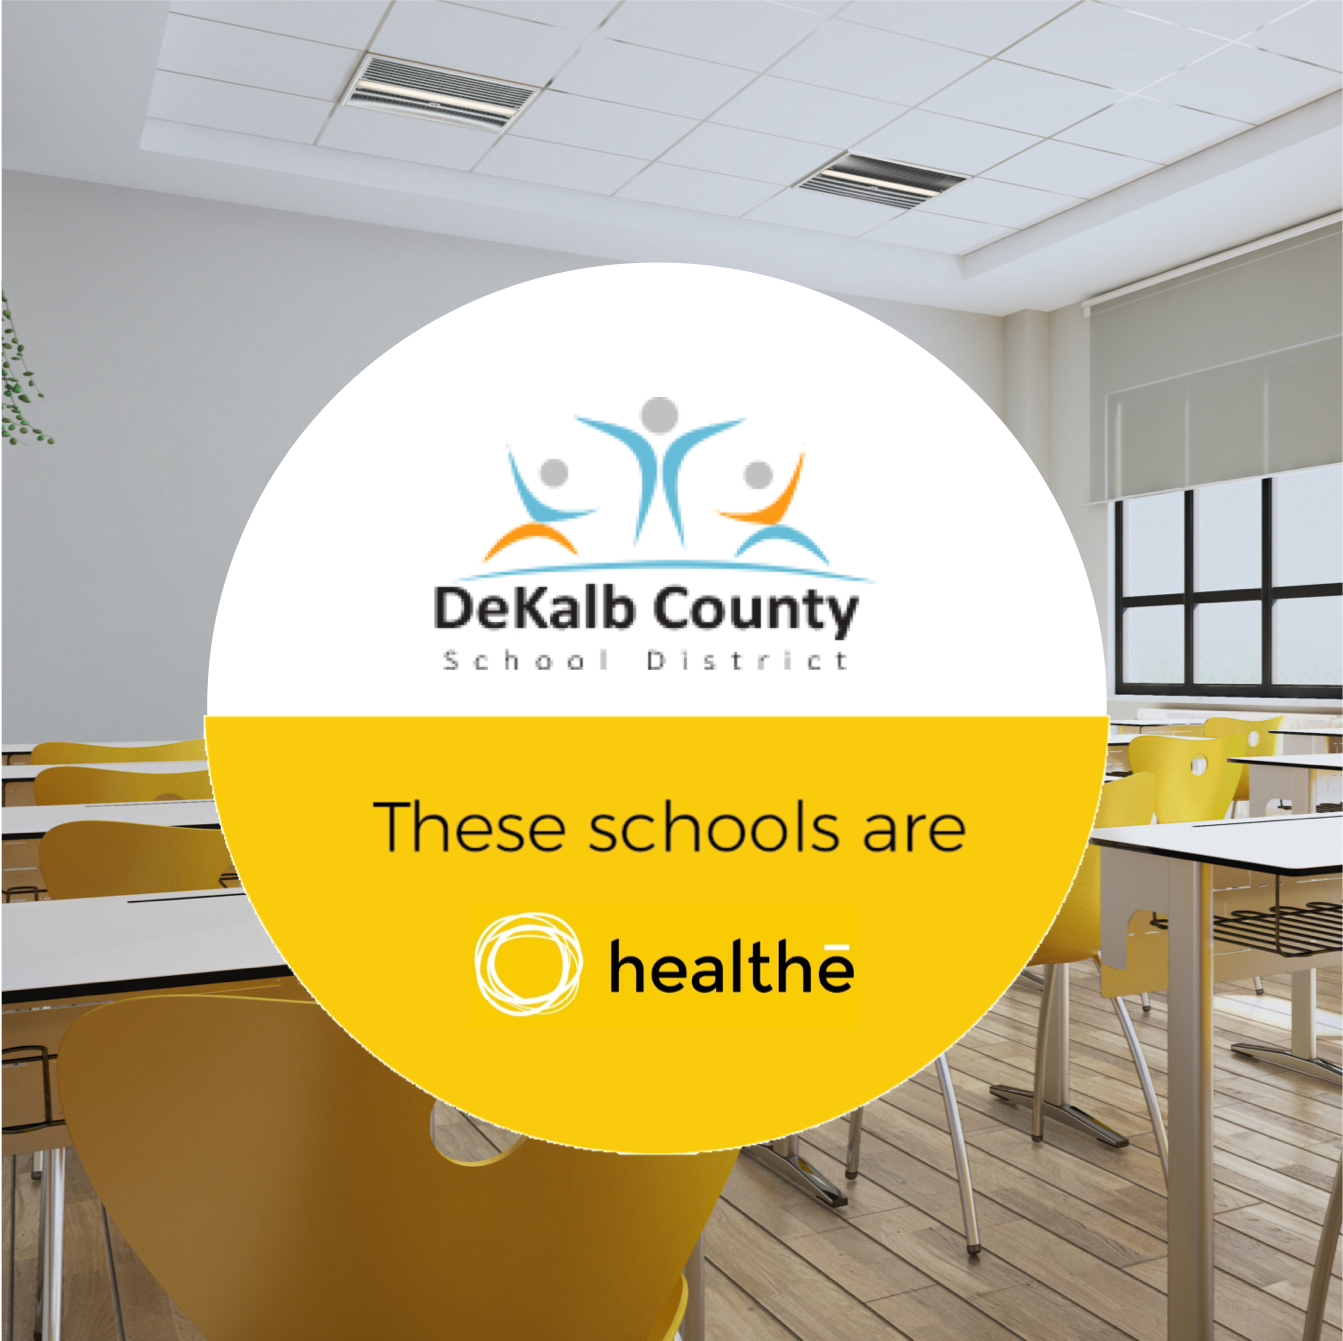 Dekalb County Schools Calendar 2022.Dekalb County School District Receives Cutting Edge Uvc Air Cleaning Technology